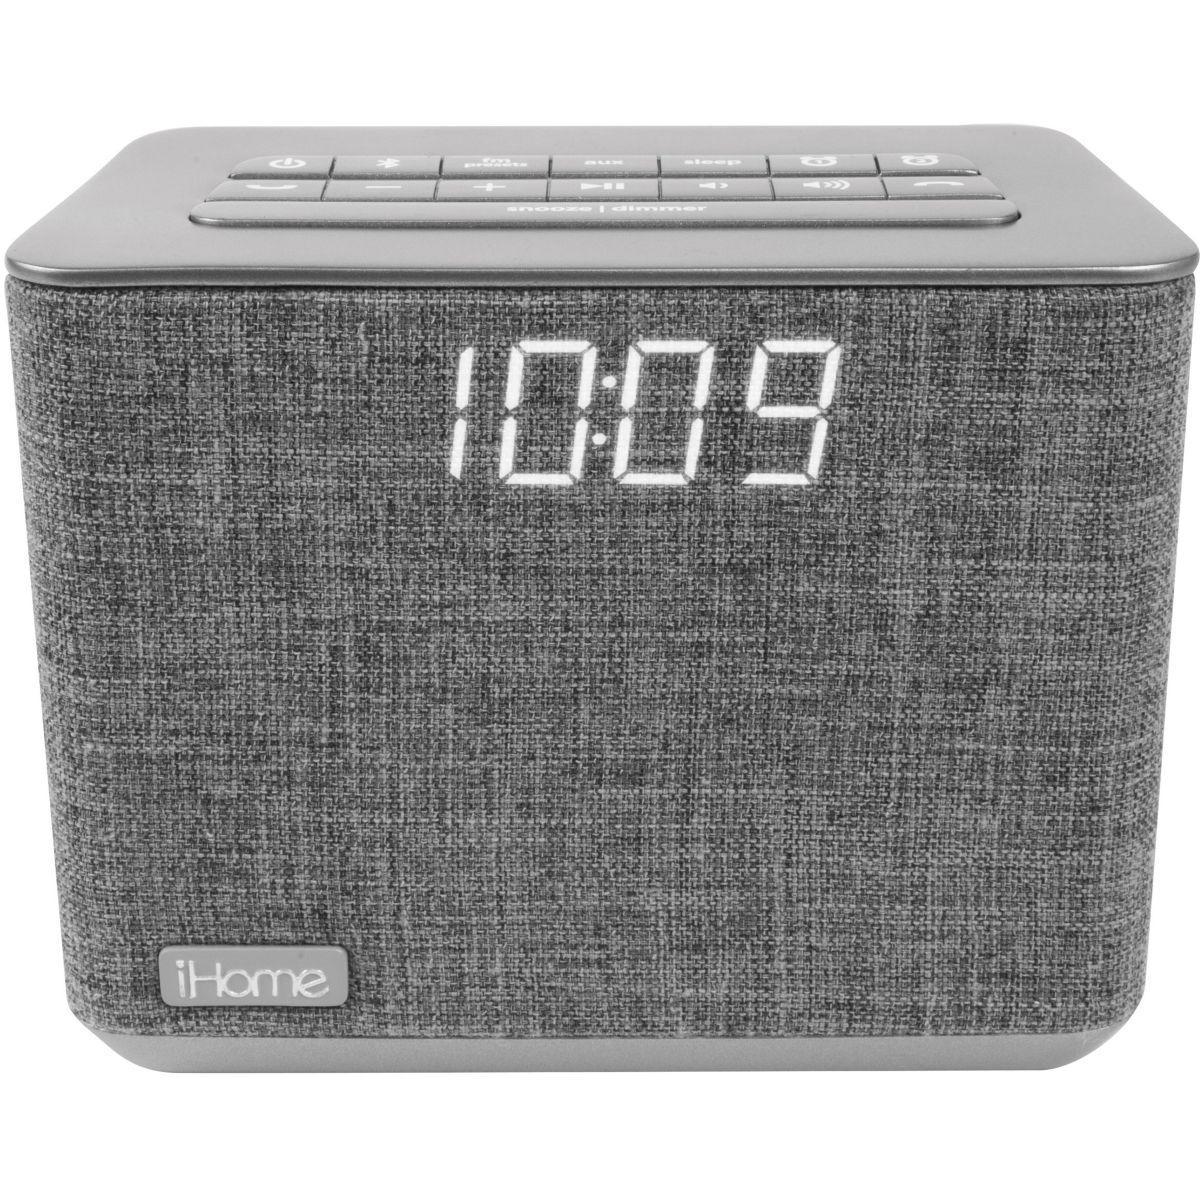 Radio r�veil ihome ibt232 - livraison offerte : code premium